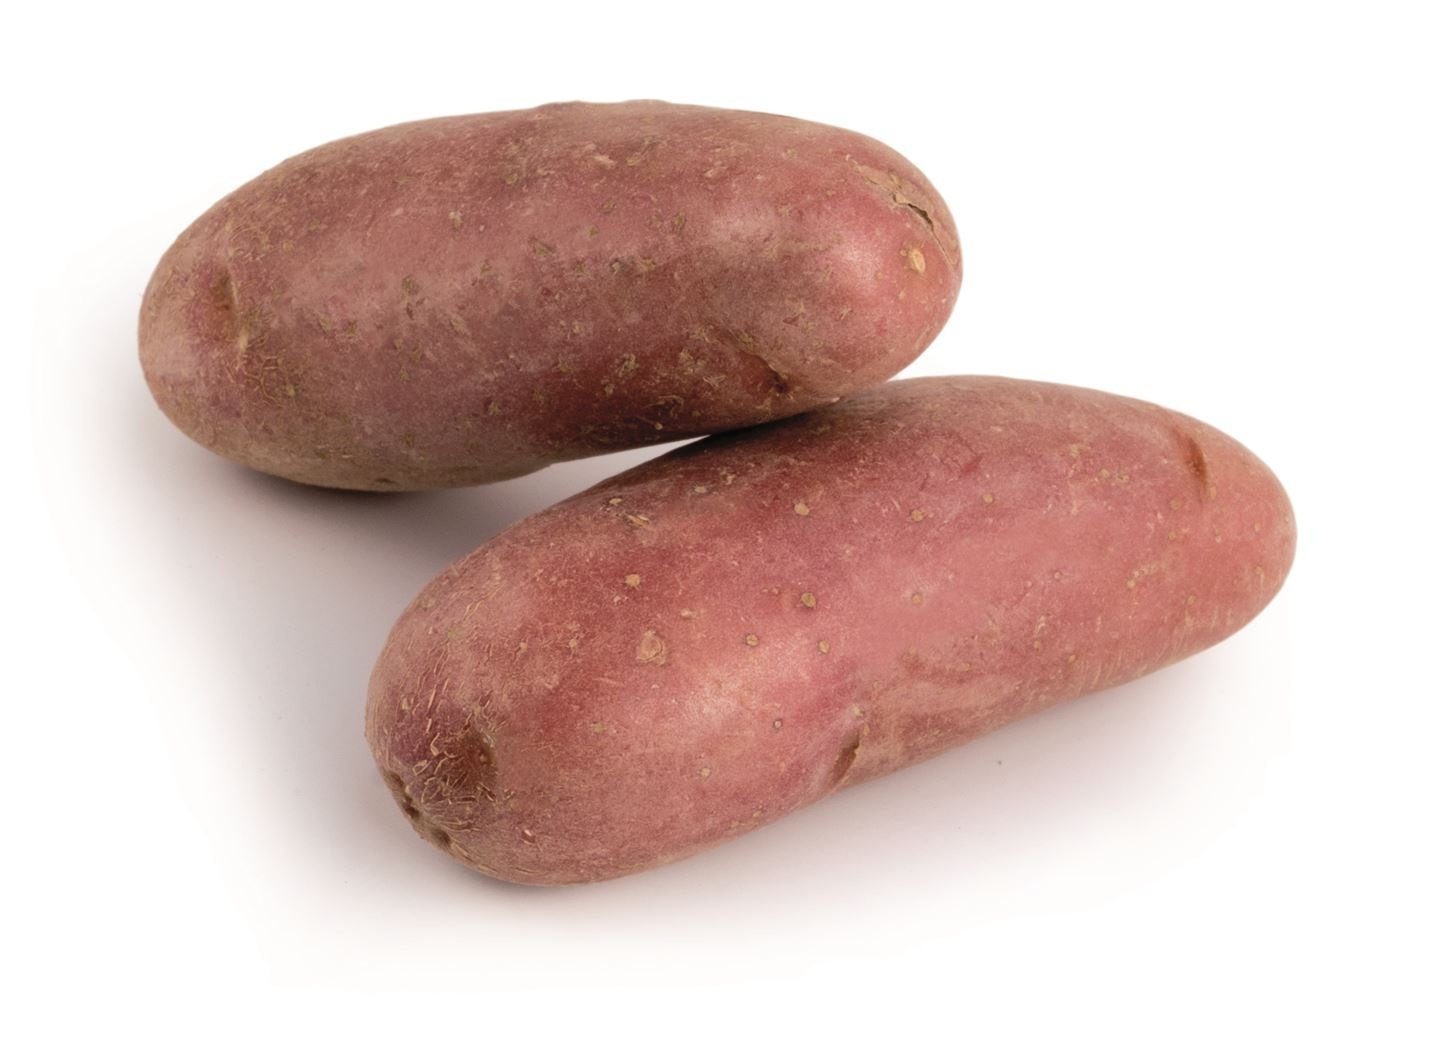 debaere pootaardappel cherie france (peau rouge) (25/30mm)